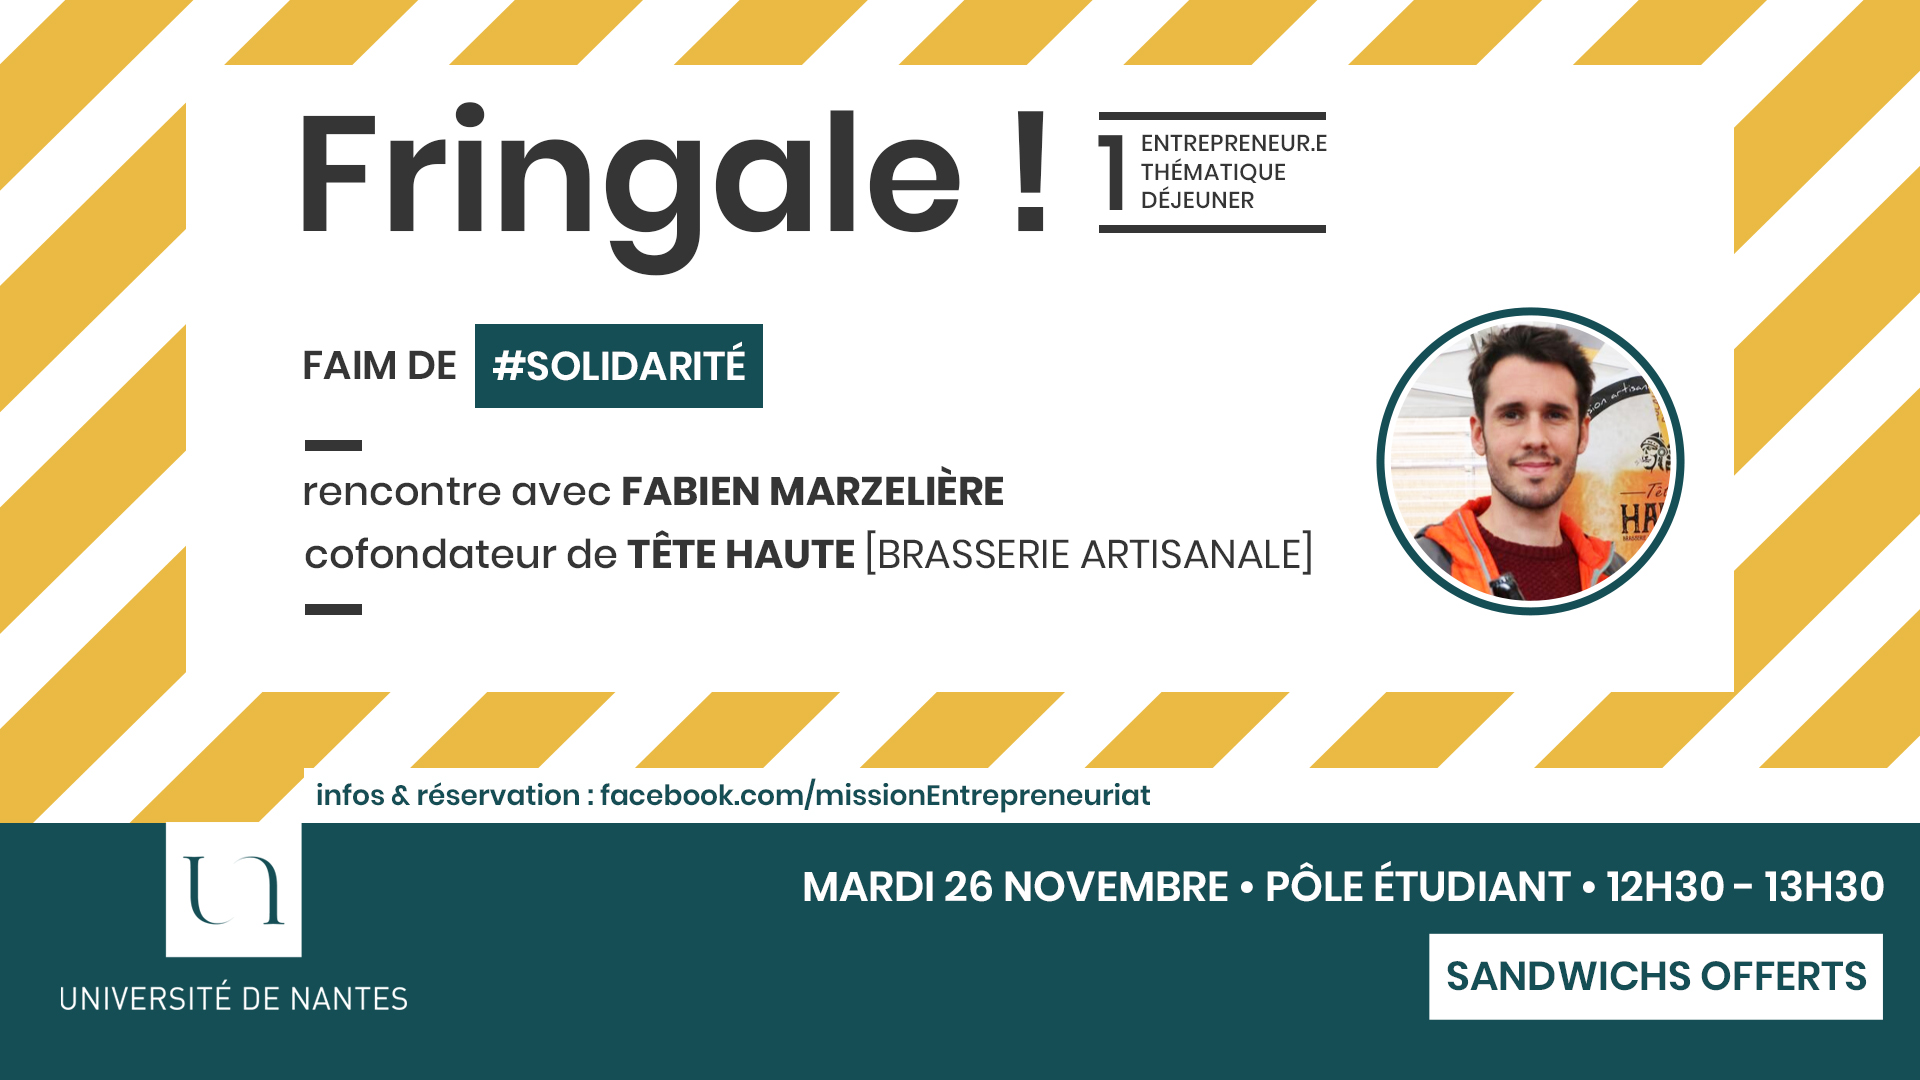 Fringale ! Tête Haute - Fabien Marzelière